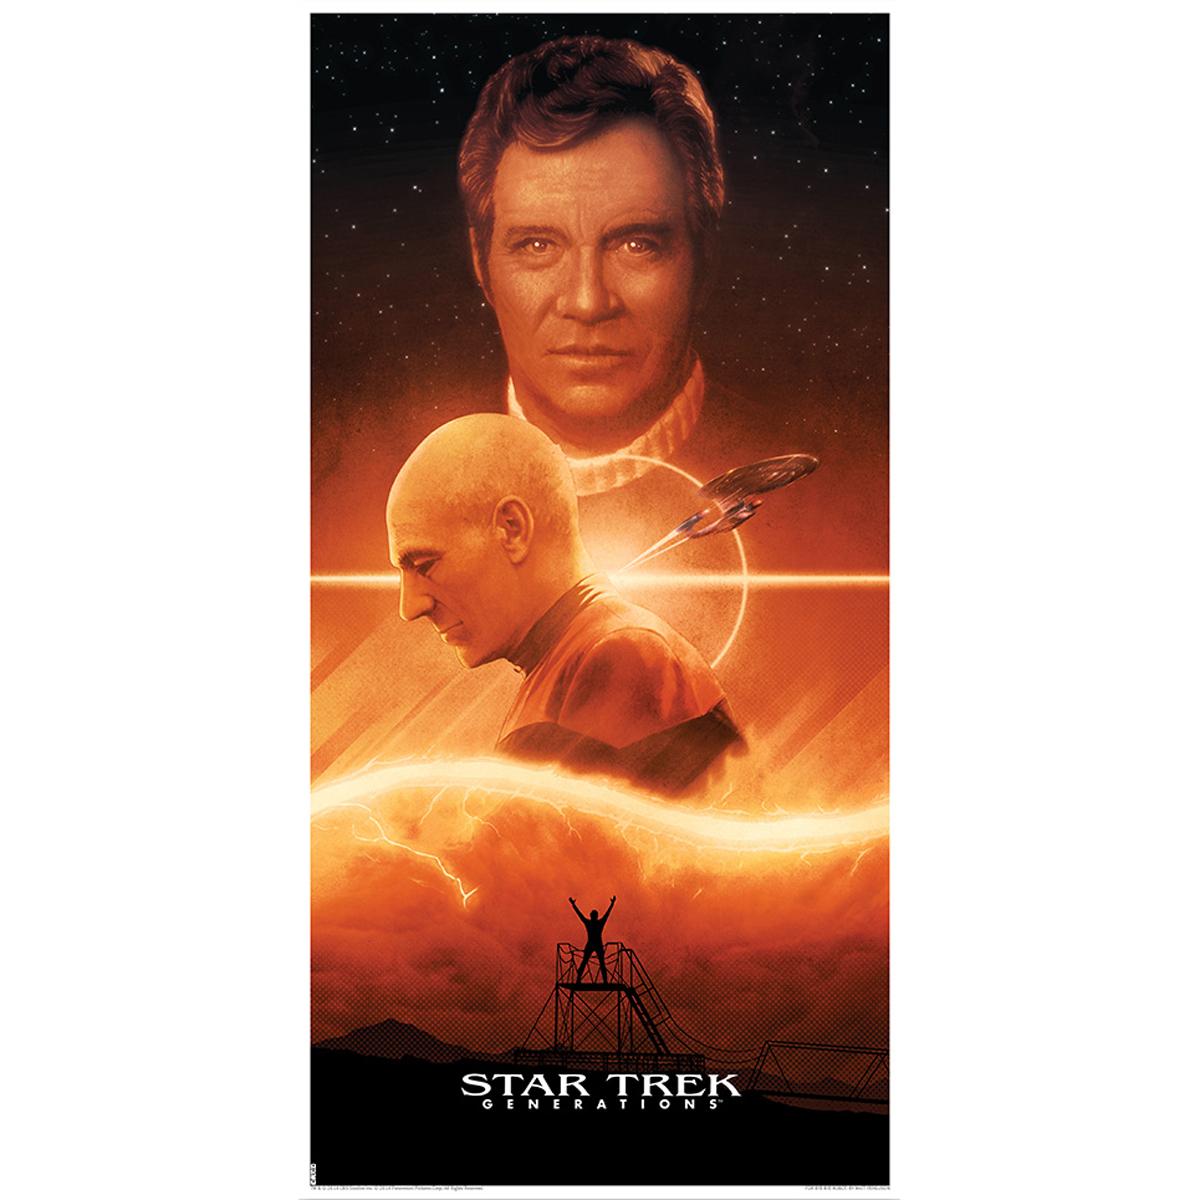 Star Trek: Generations Lithography [12x24]